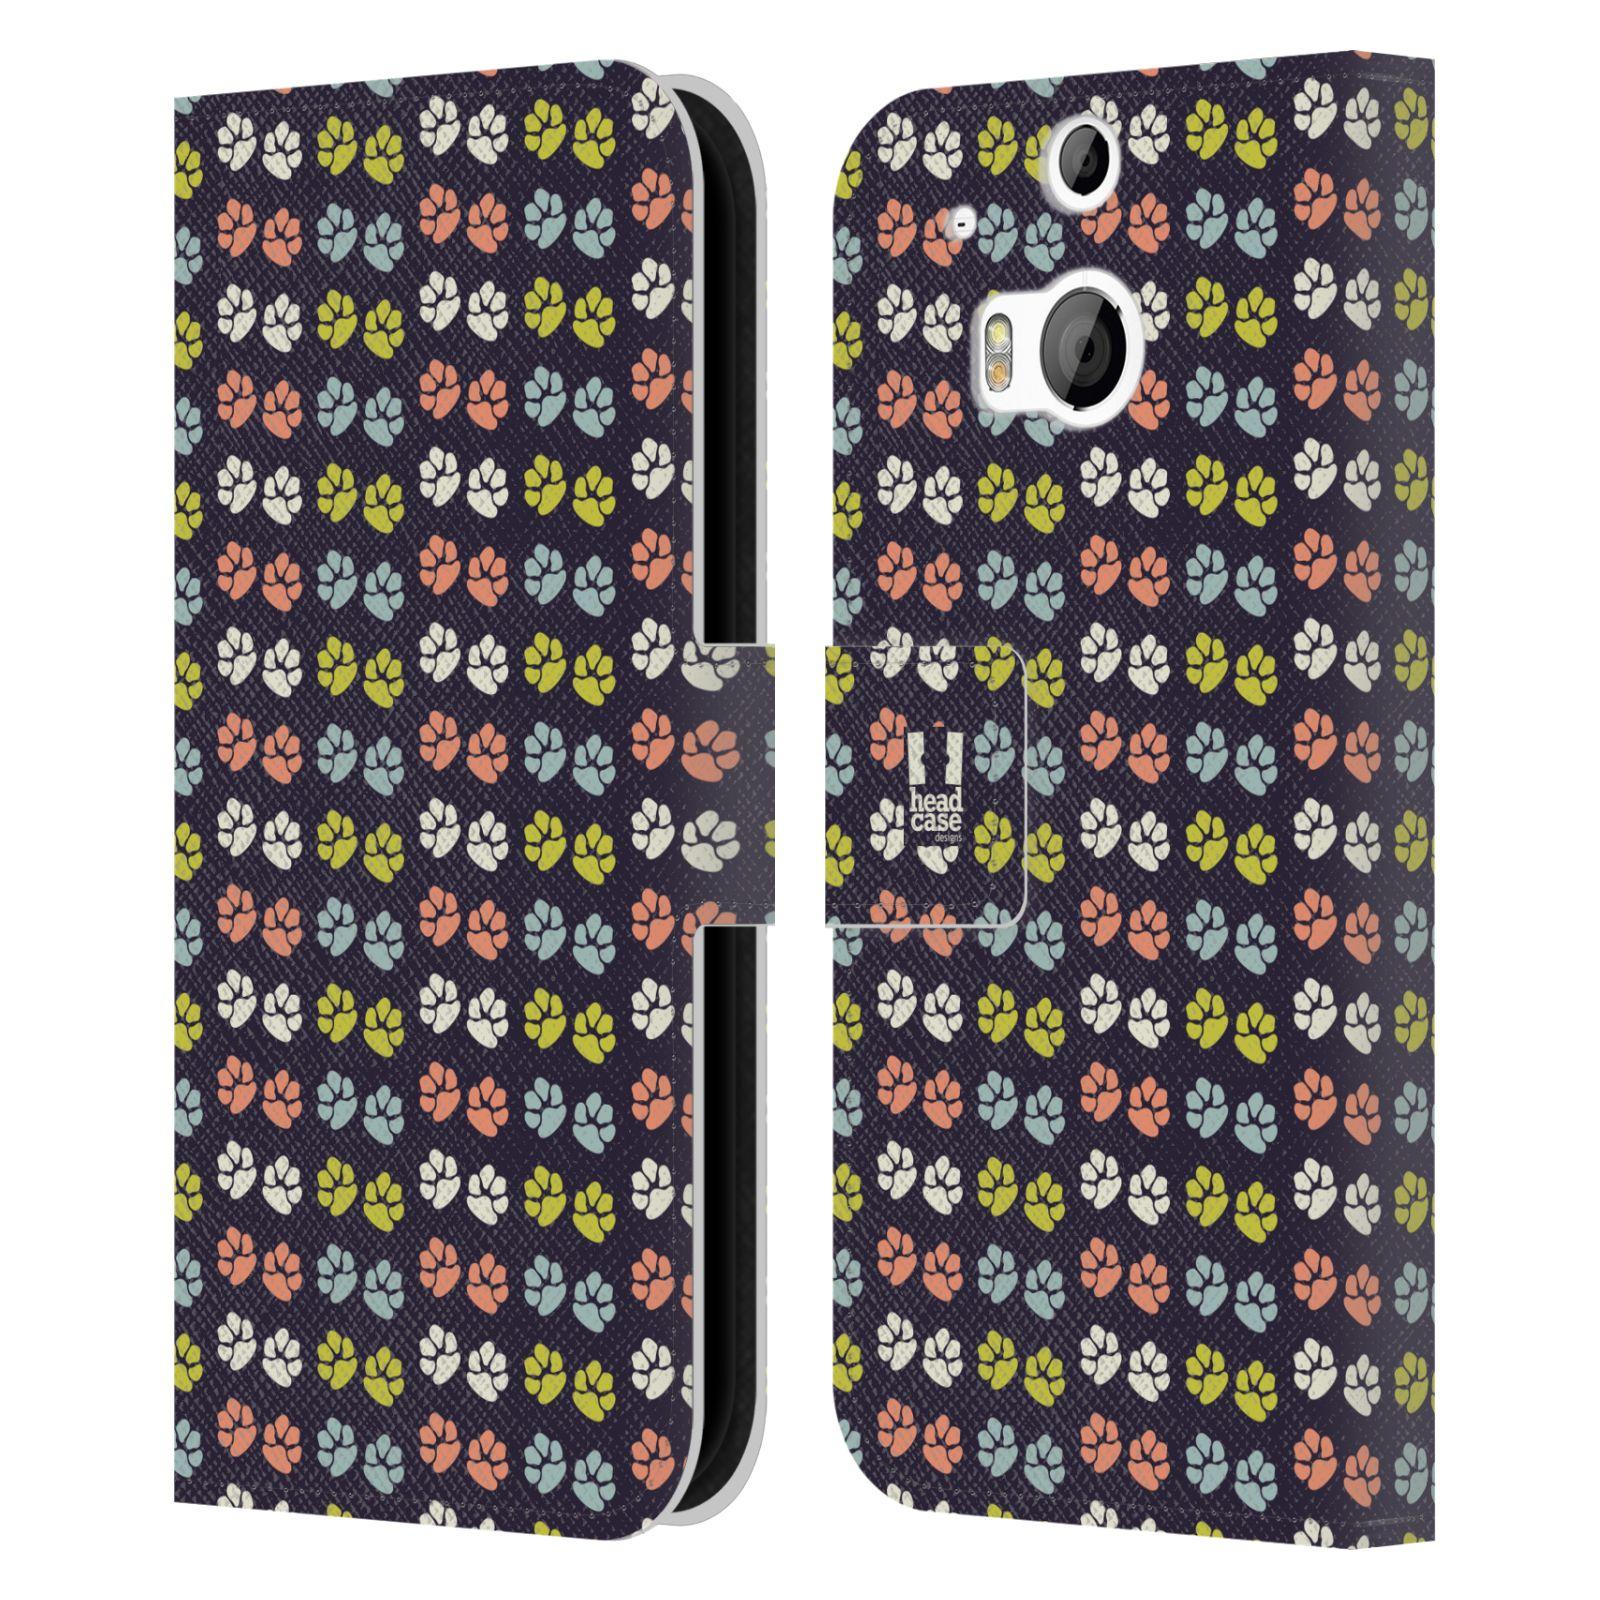 HEAD CASE Flipové pouzdro pro mobil HTC ONE (M8, M8s) Pejsek ťapky barevné RETRO